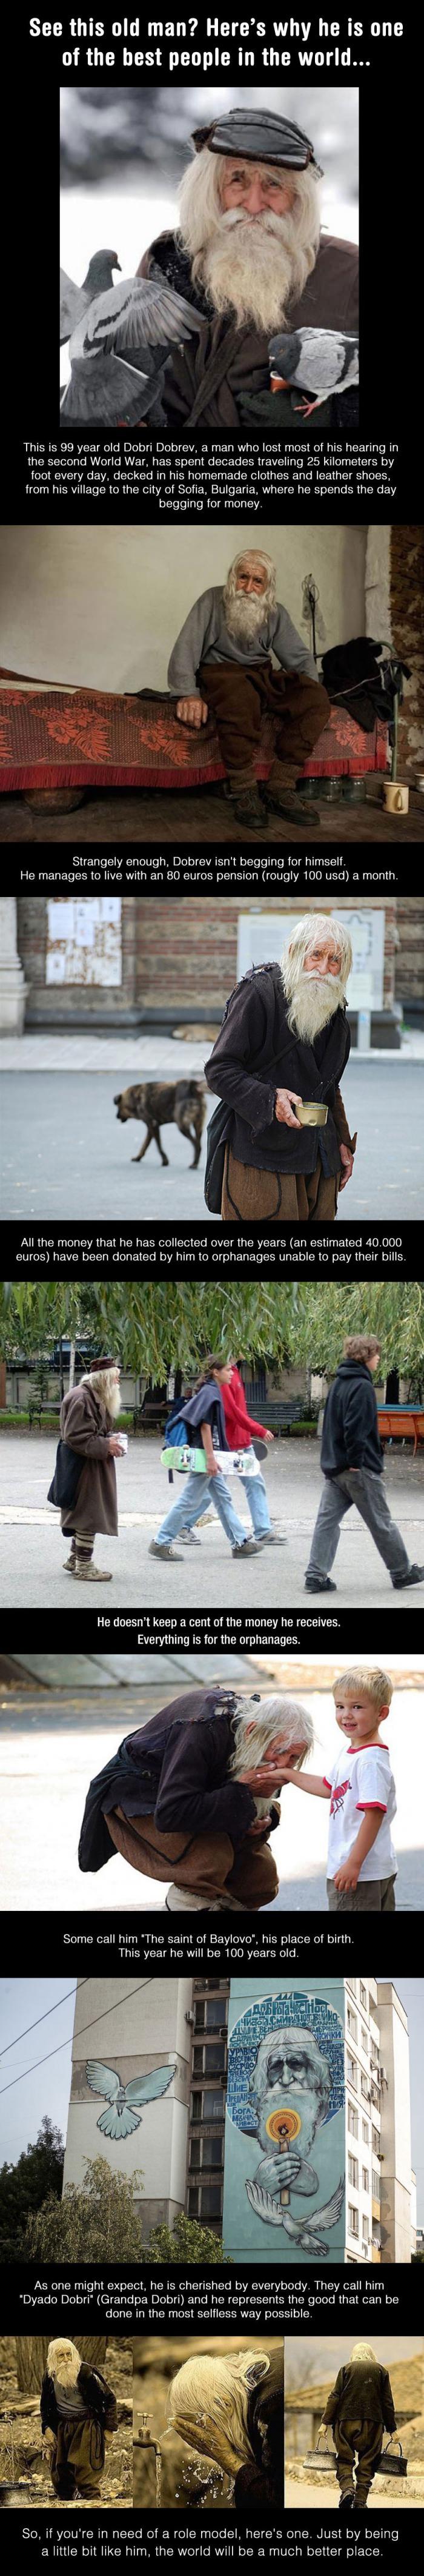 99-year-old-beggar-homeless-man-shows-true-love